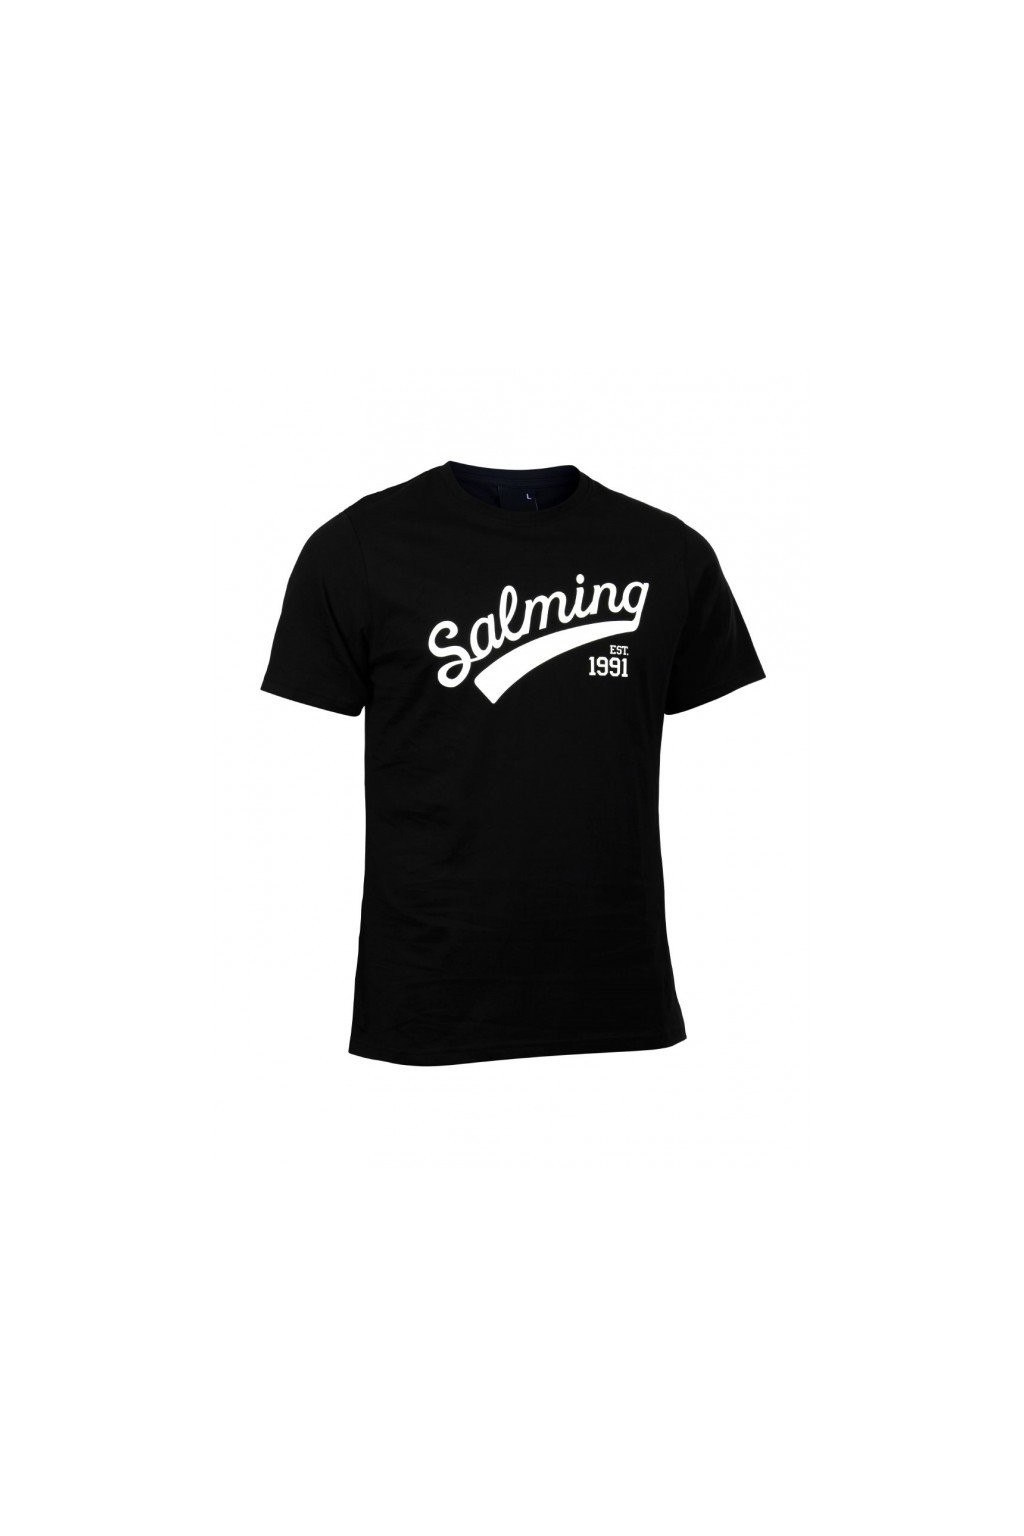 salming logo tee black xxxl